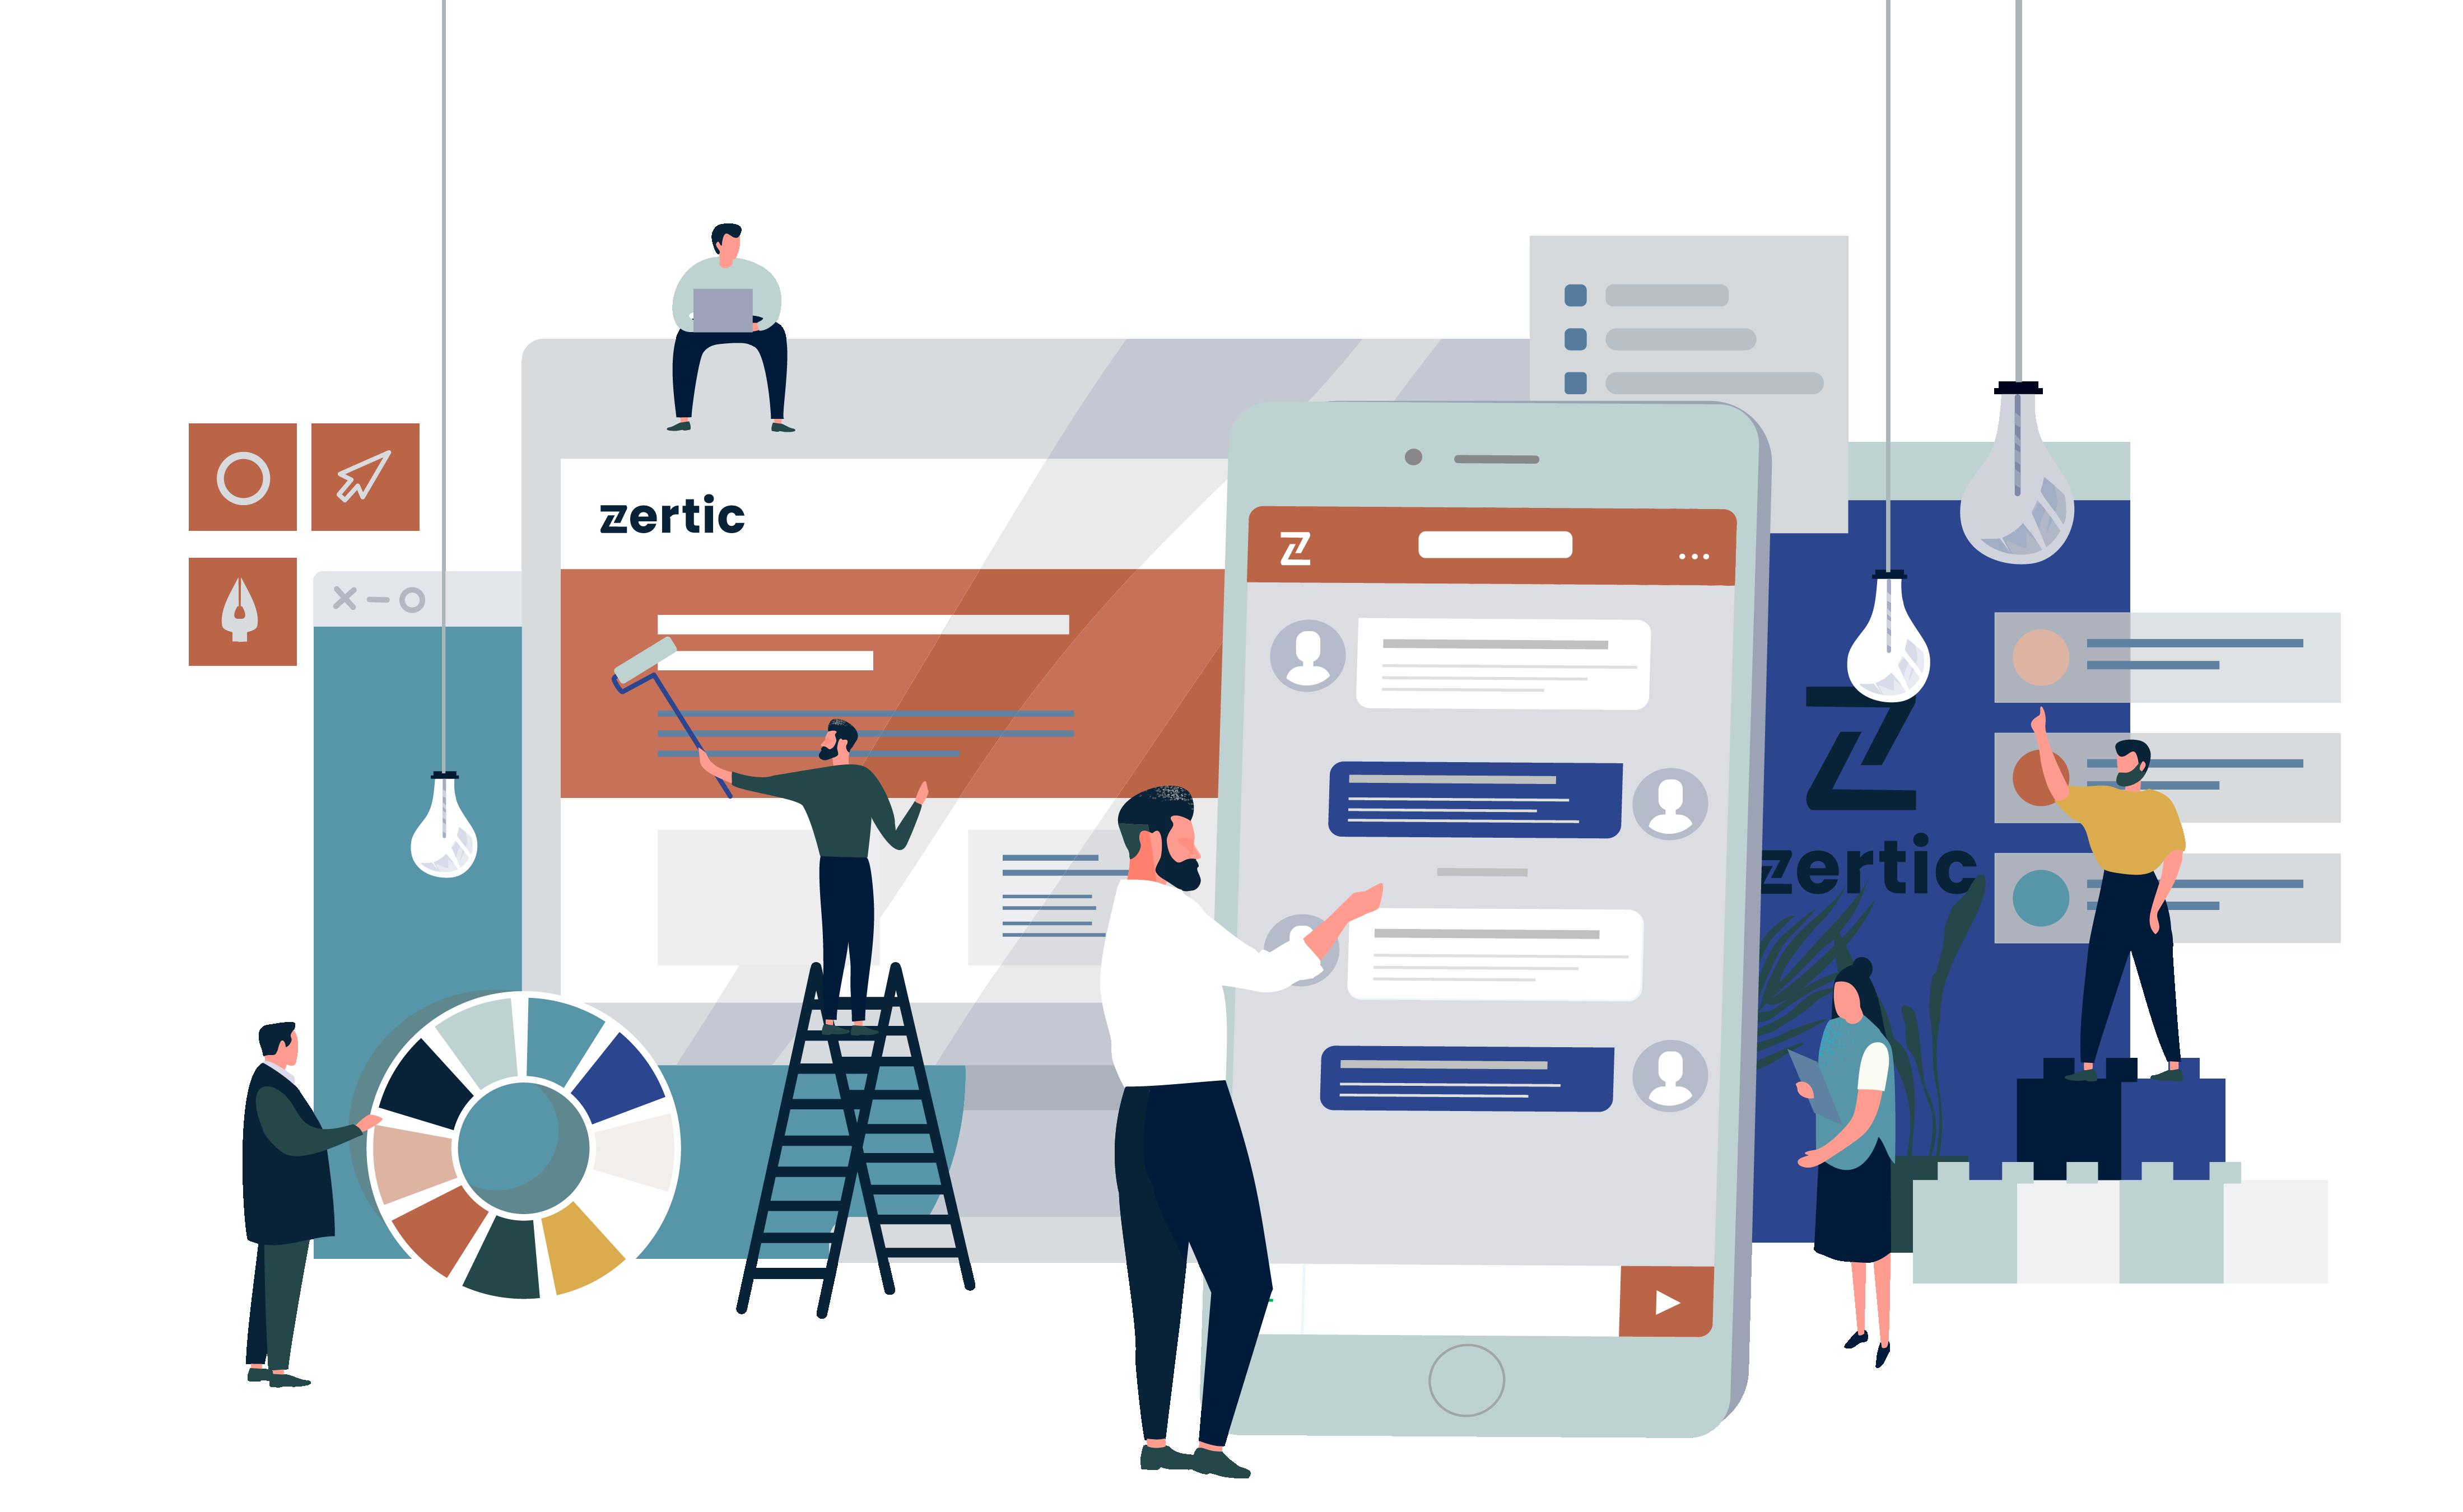 zertic - test, inspection, certification software